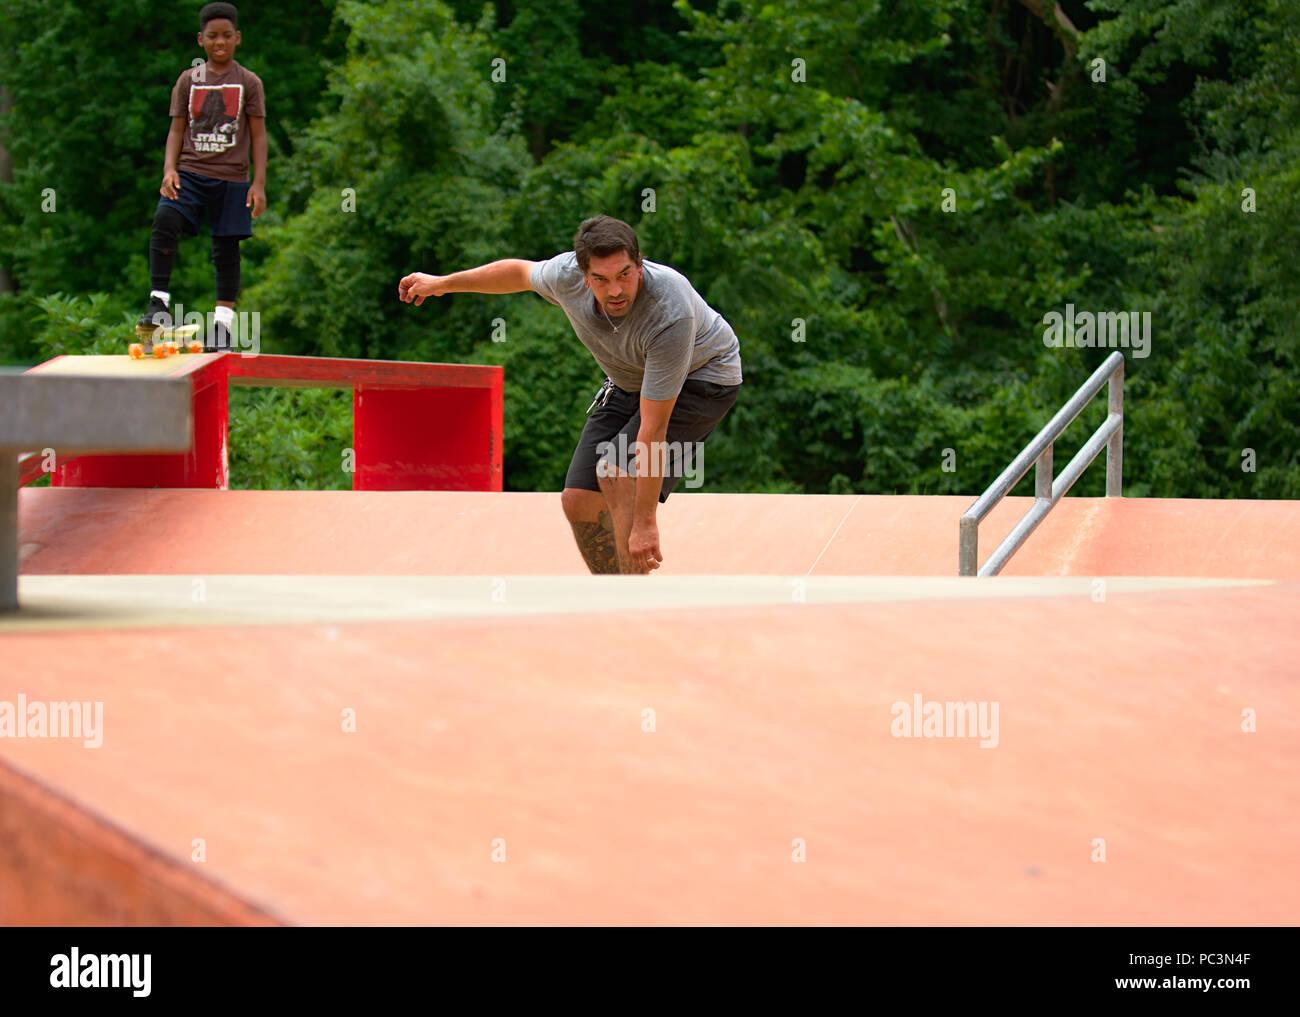 Pre Teen watching 30+ adult skateboarding - Stock Image